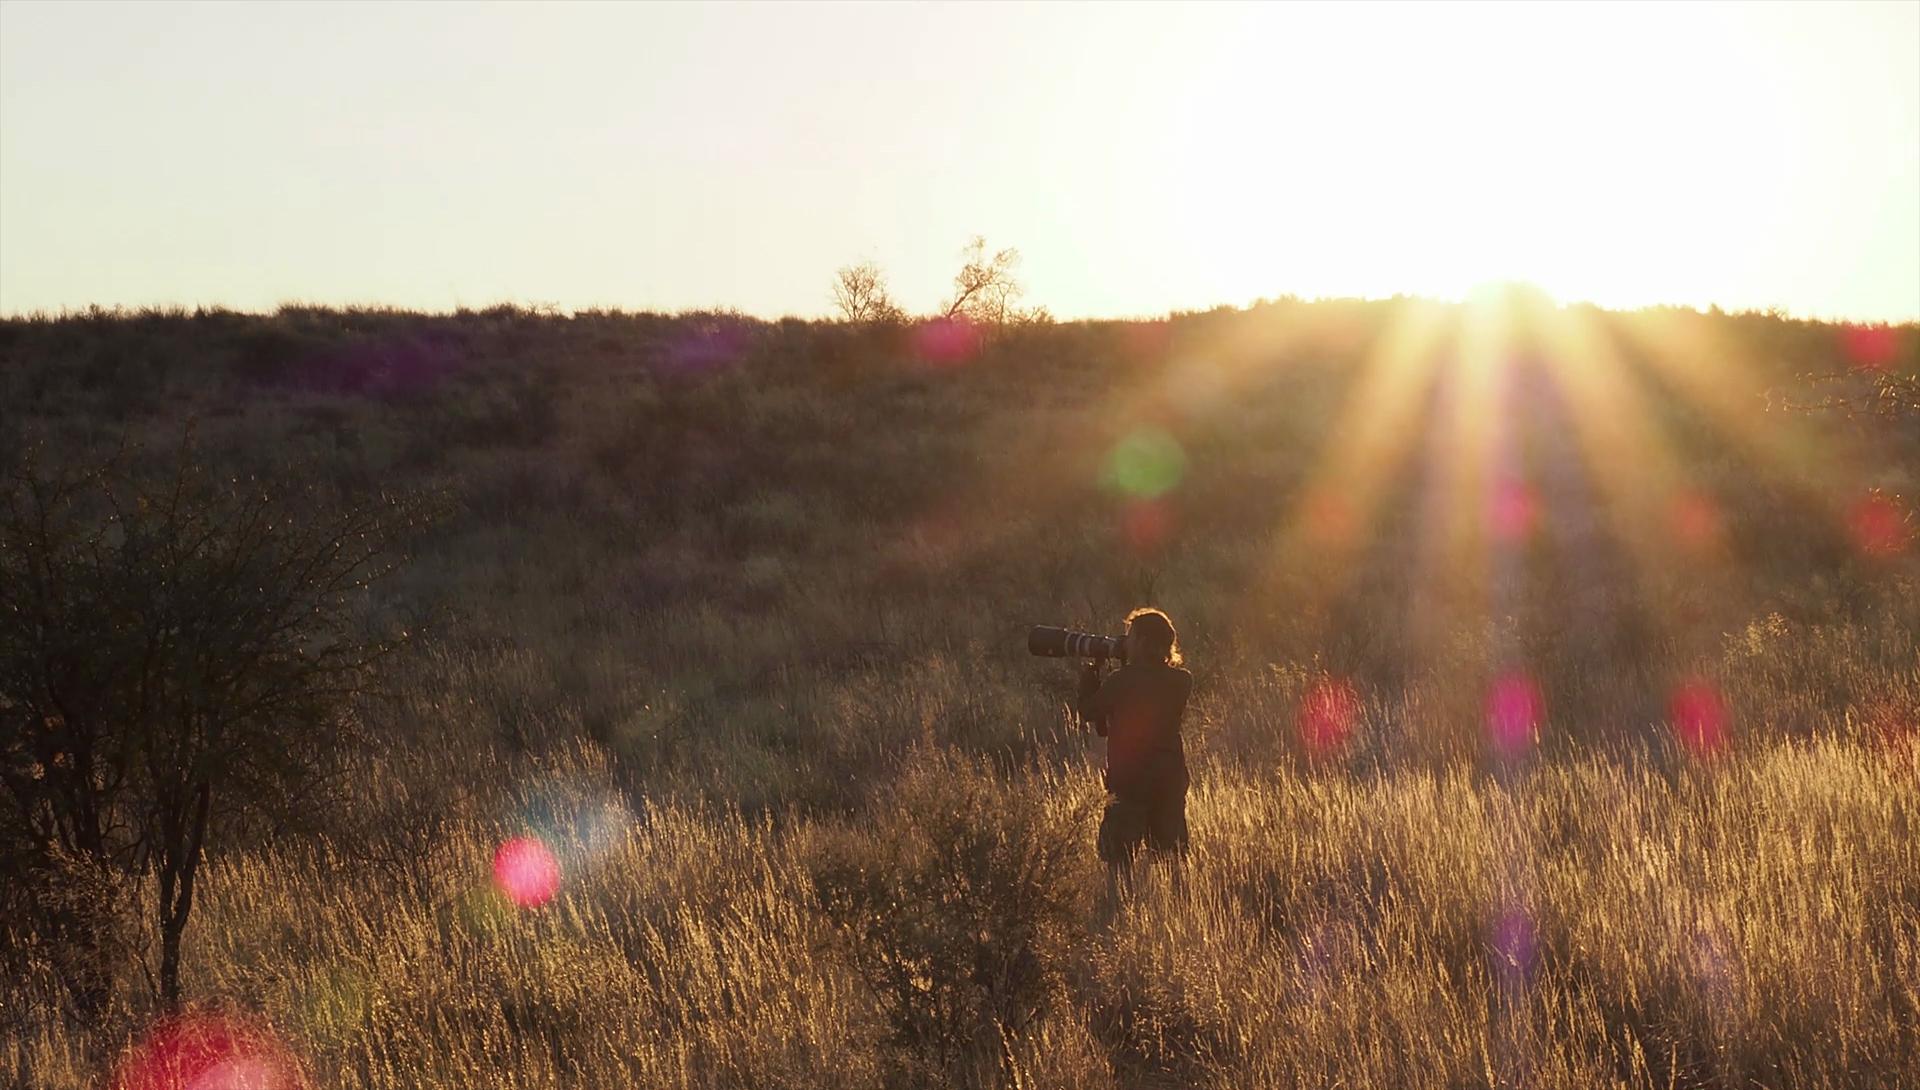 Fotografiando en el desierto